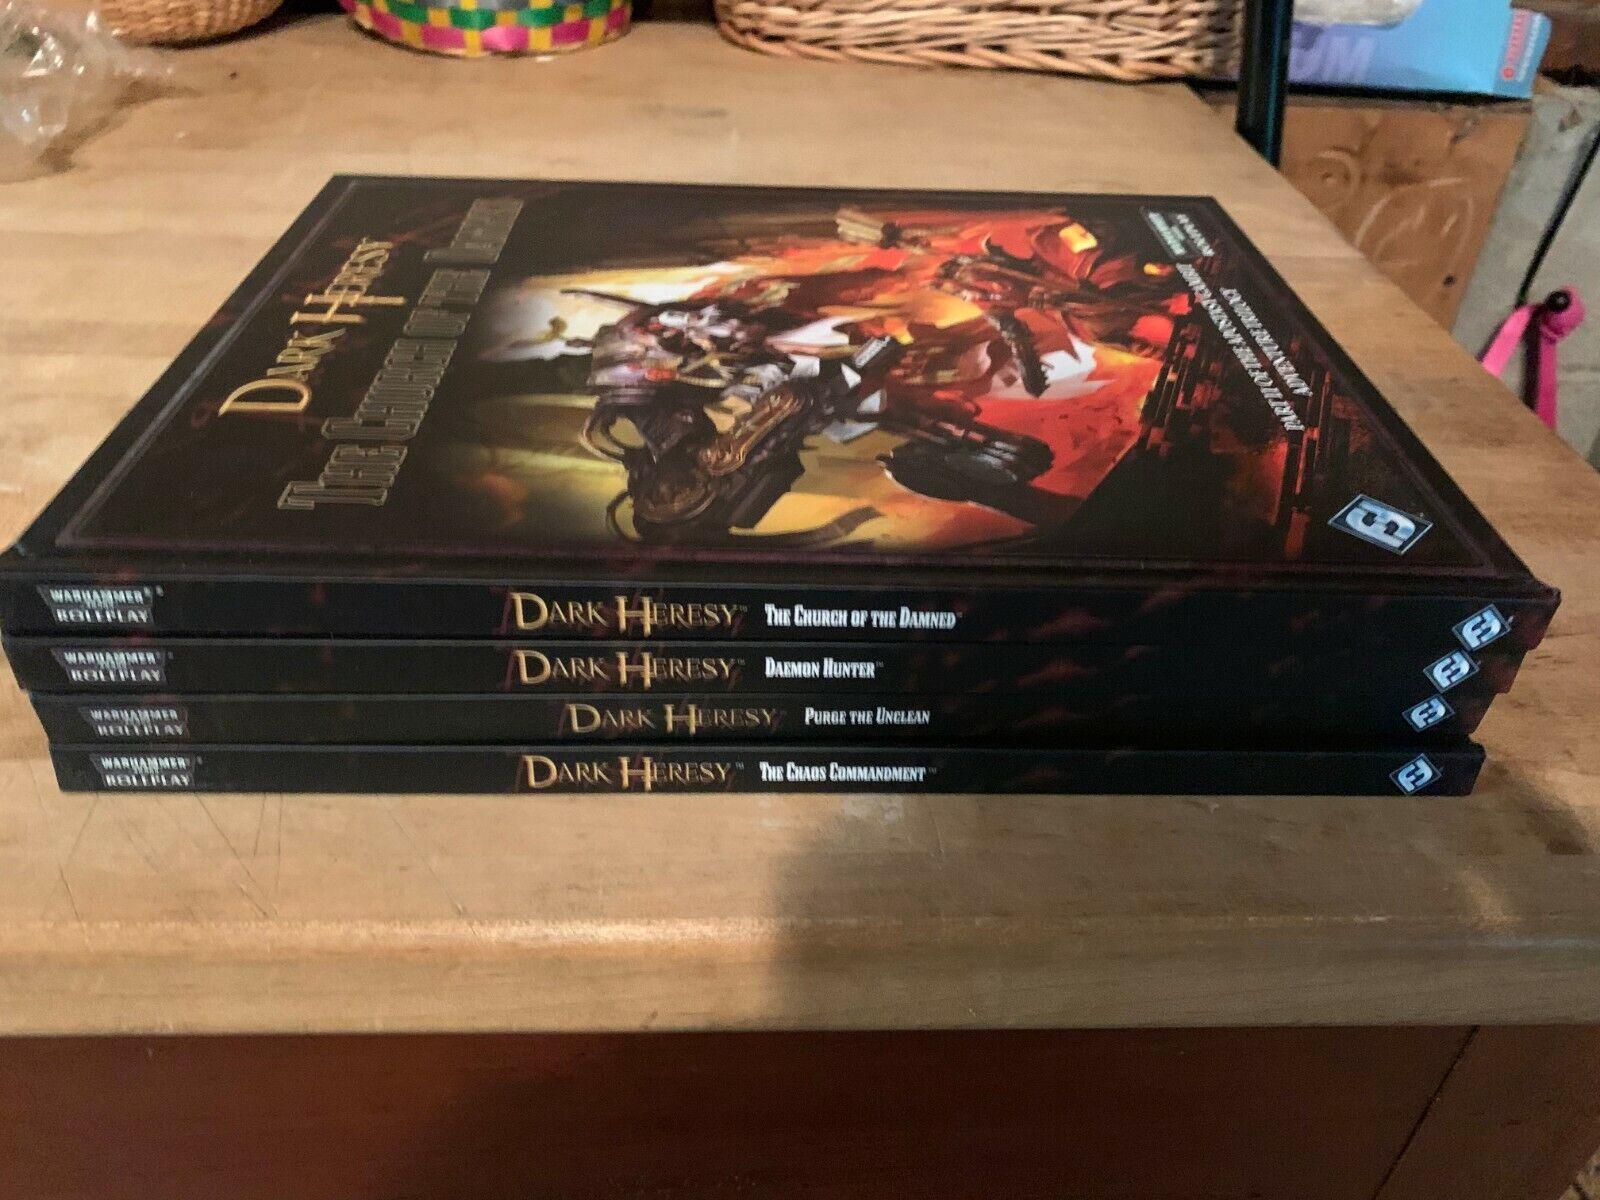 Ffg Dark Heresy Rpg Lot 4 Books Brand New Hardcovers Warhammer 40k Roleplaying